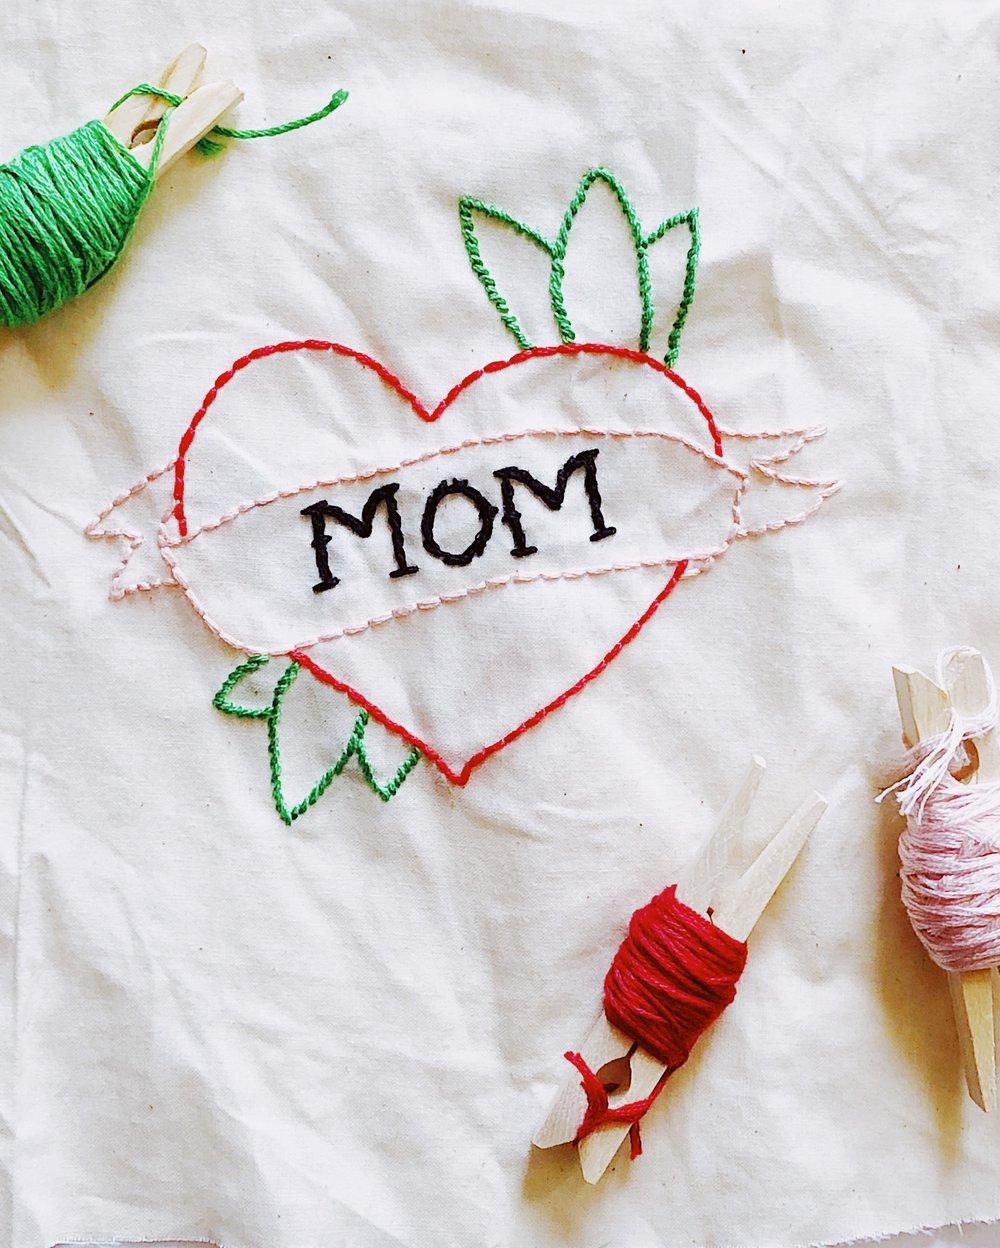 mom_embroidery2.JPG